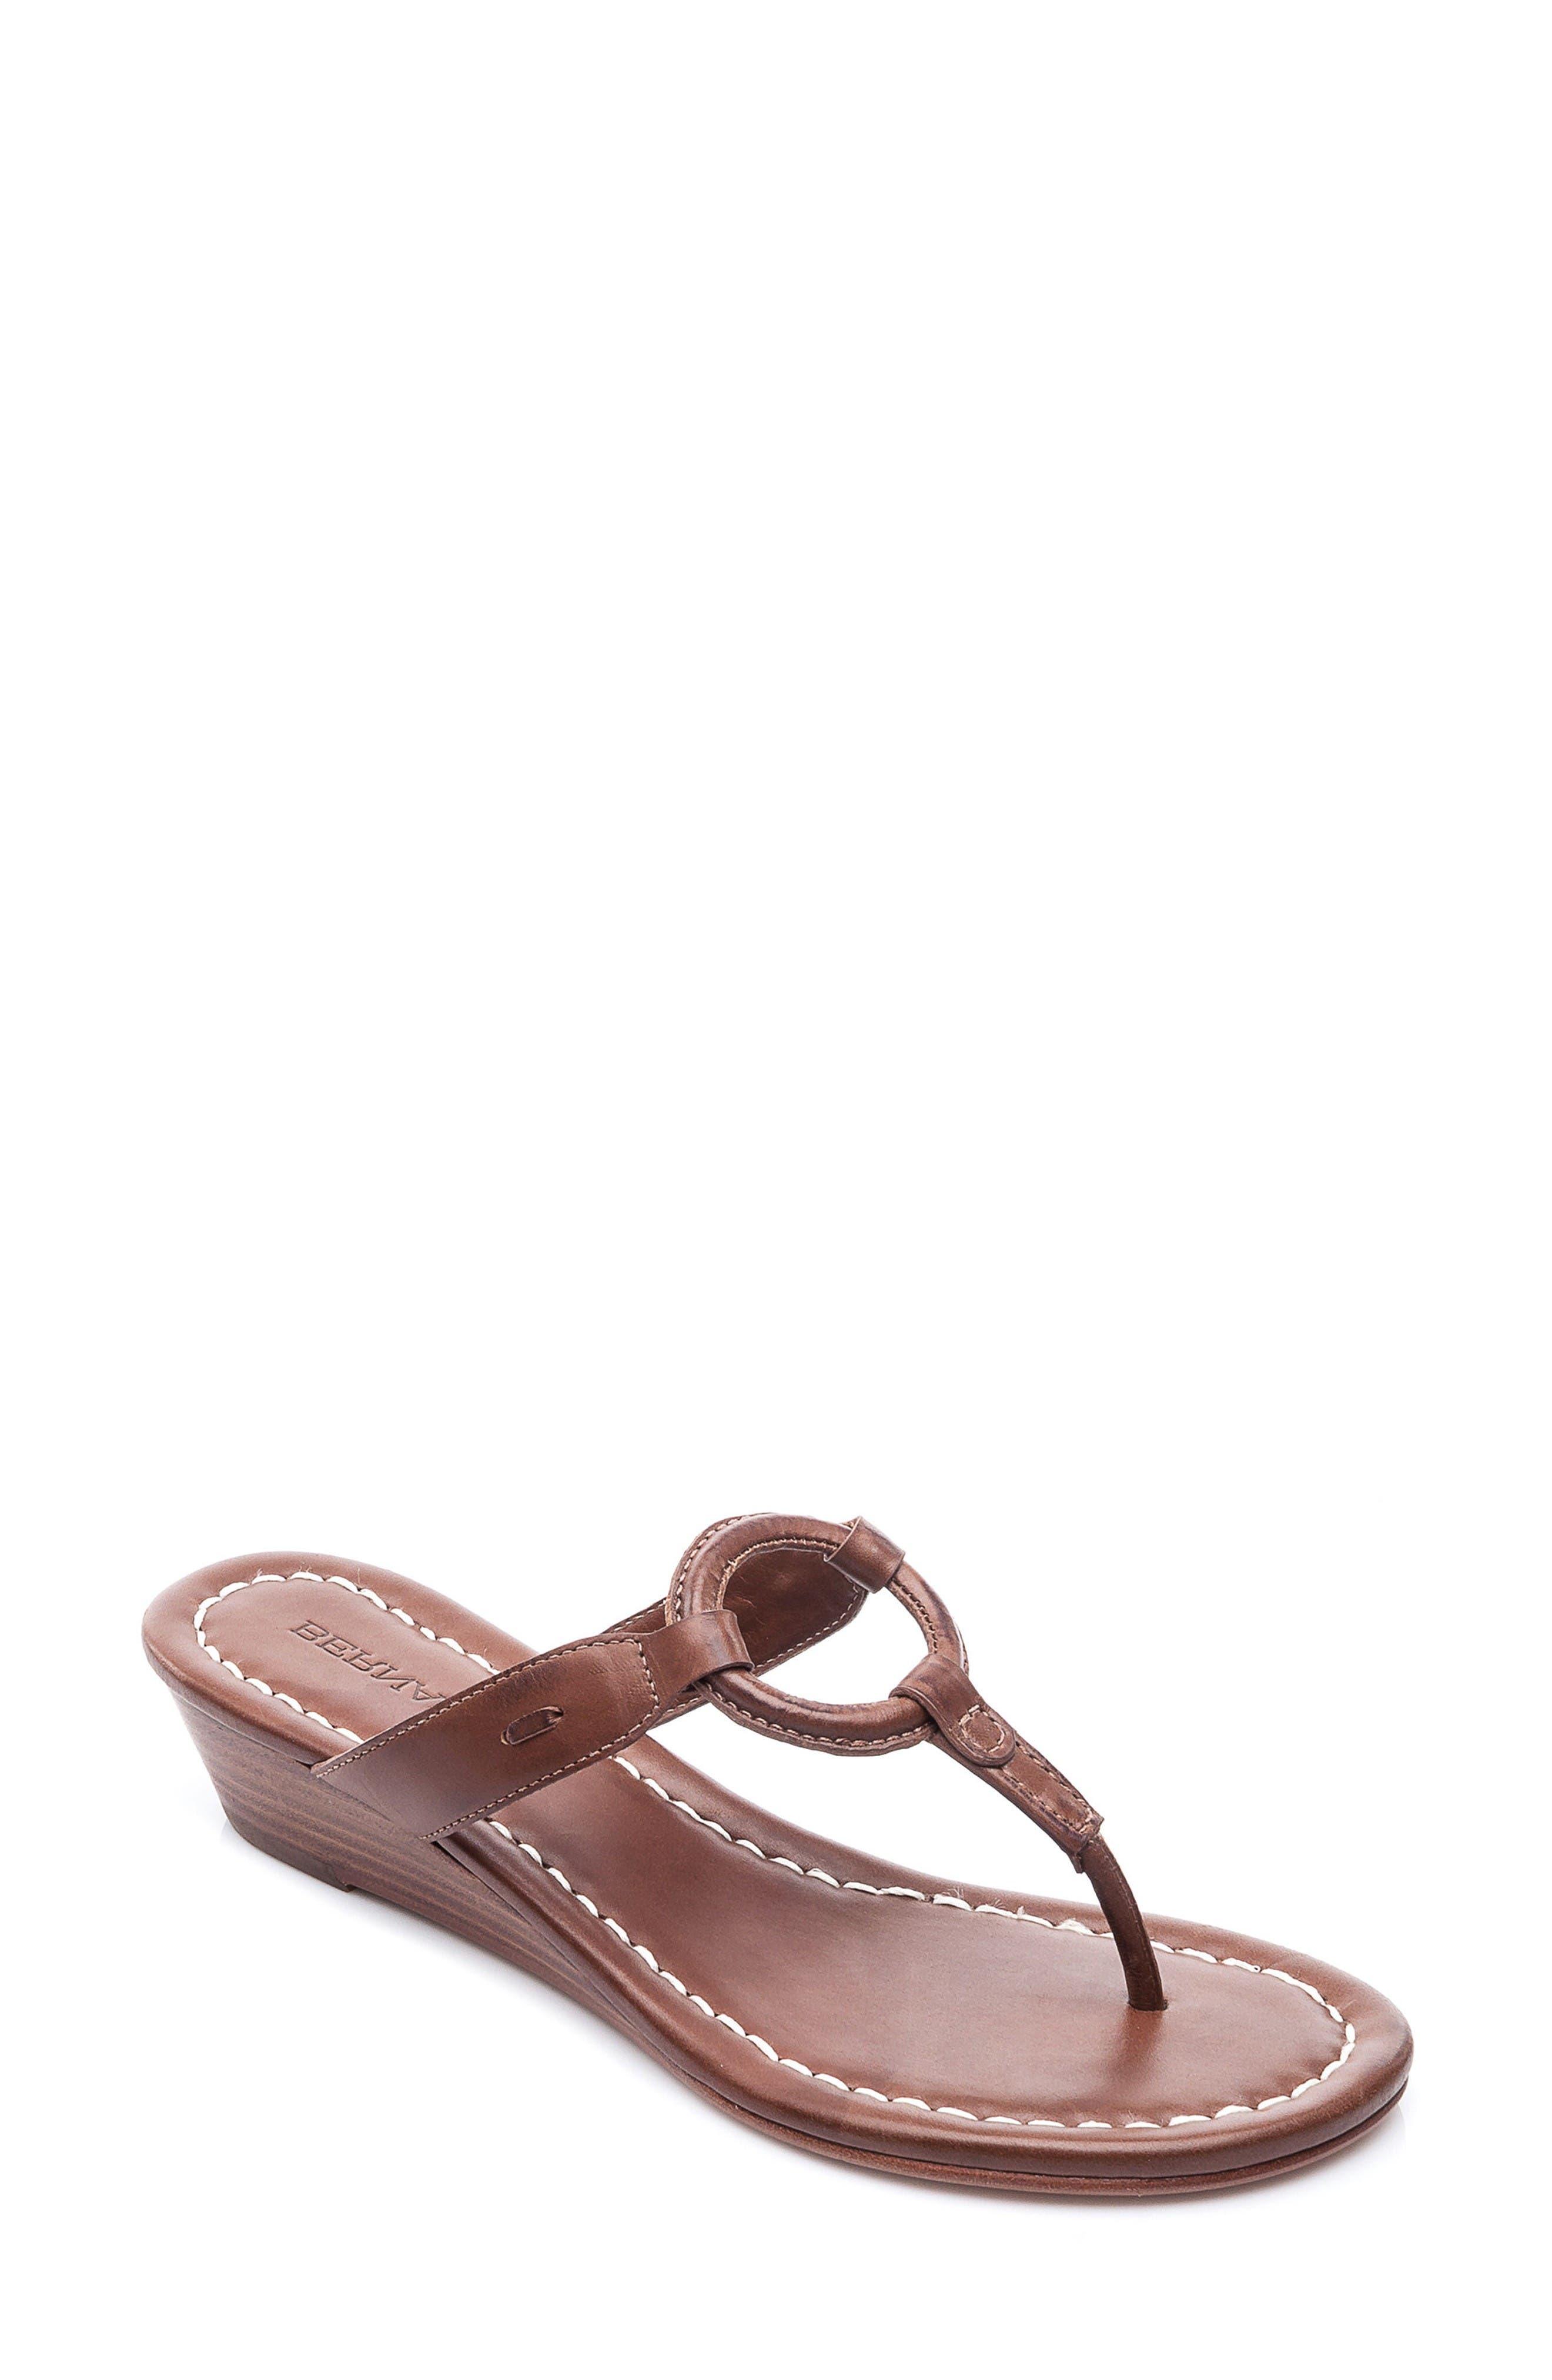 Alternate Image 1 Selected - Bernardo Matrix Wedge Sandal